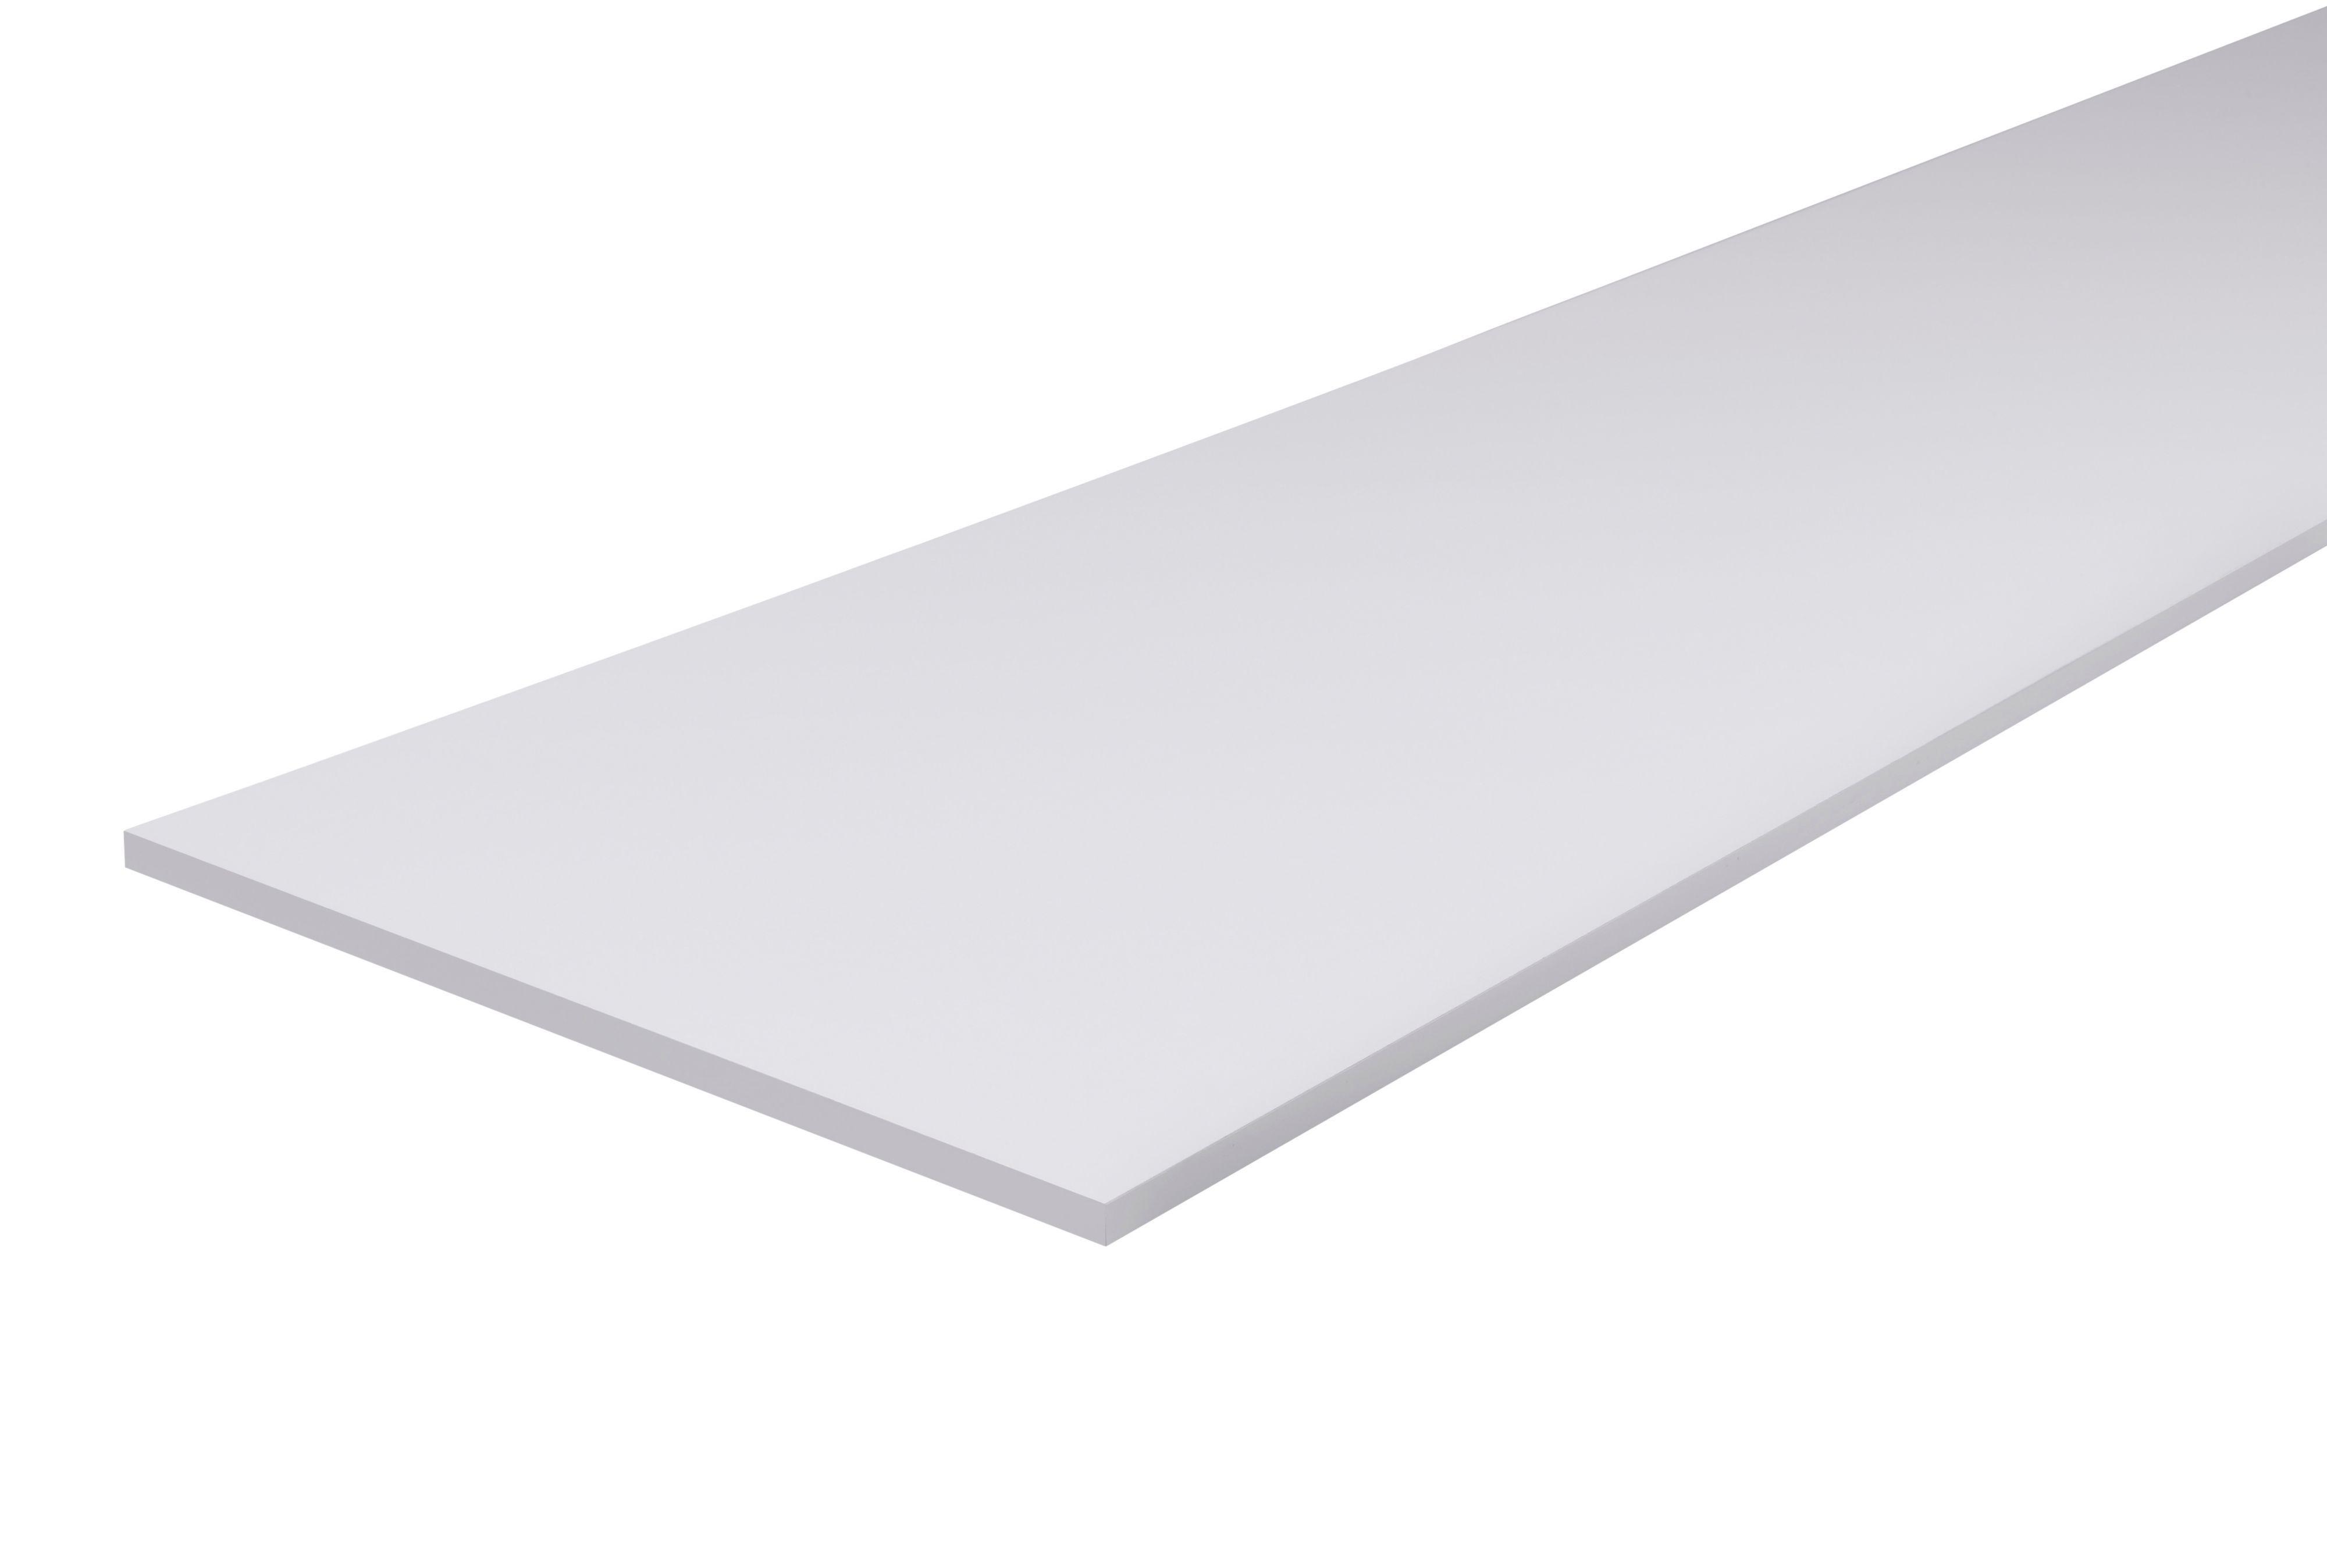 Chipboard White Furniture Board L 1200mm W 400mm T 18mm